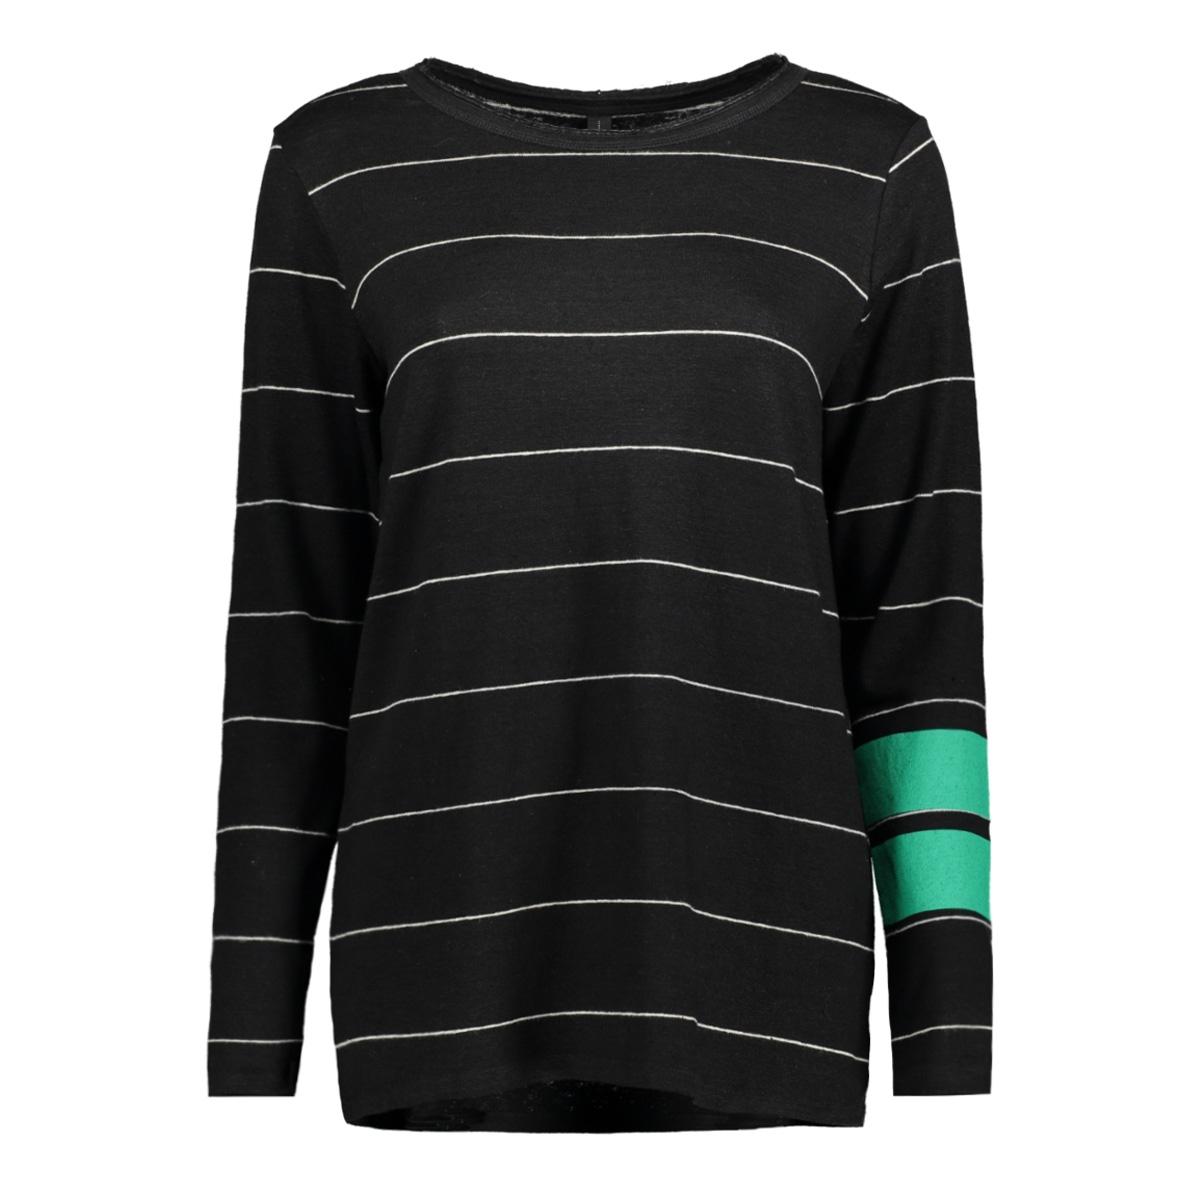 longsleeve tee thin 20 782 8103 10 days t-shirt black/bone